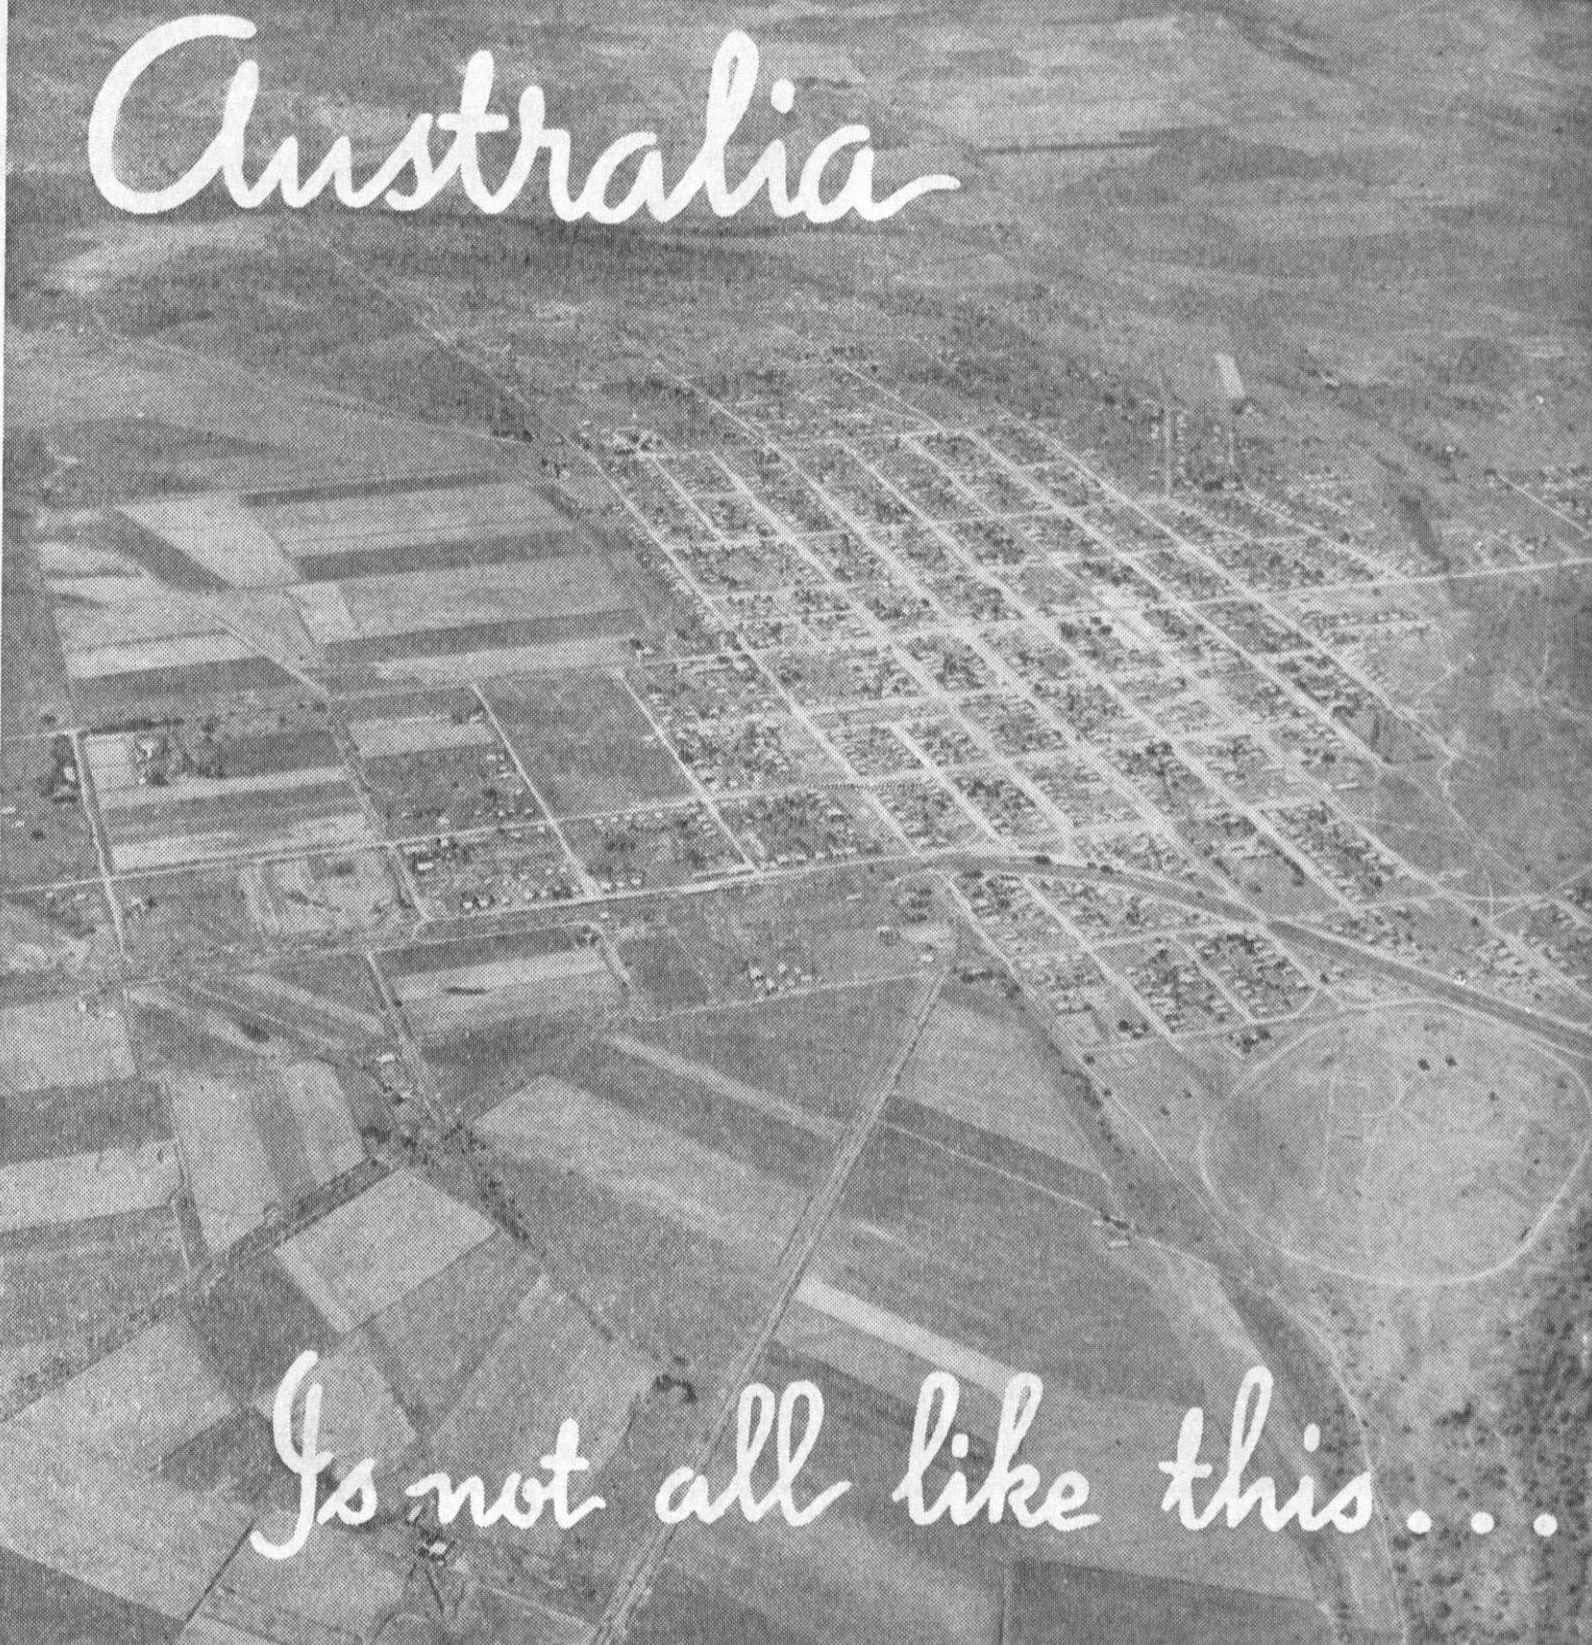 aerial shot of agricultural land